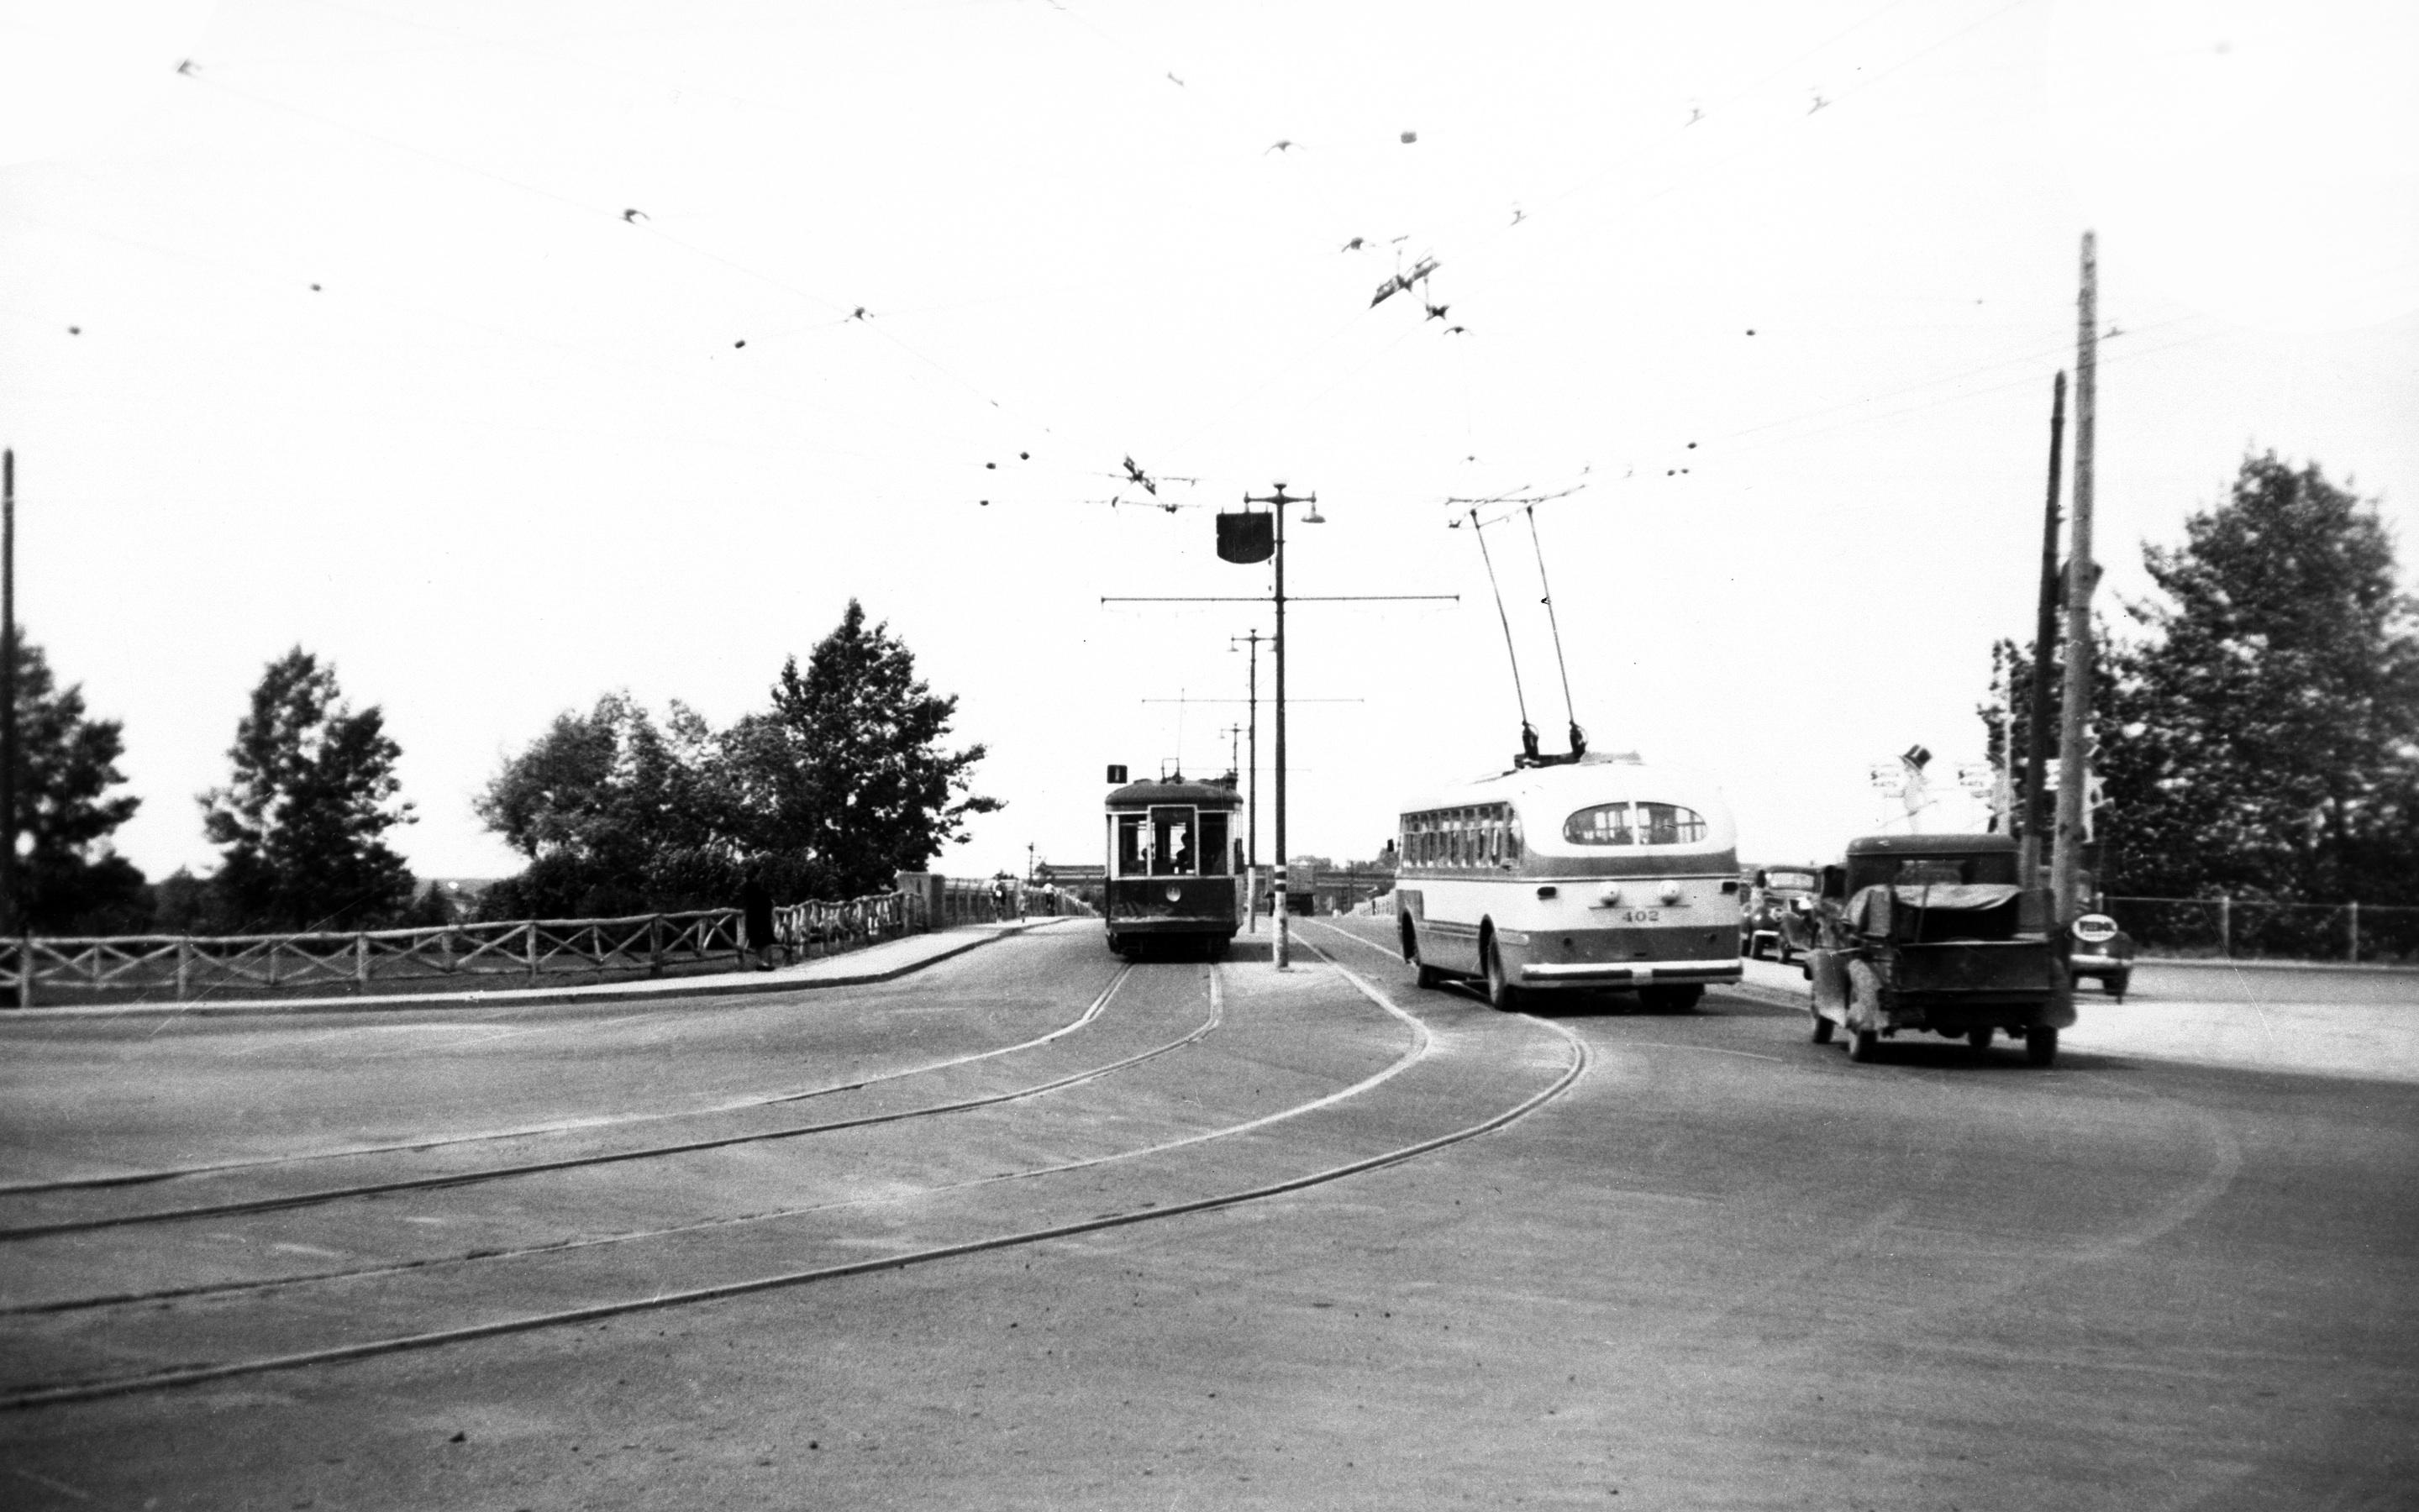 Trolley bus and street railway car on Louise bridge, Calgary, Alberta, 1947